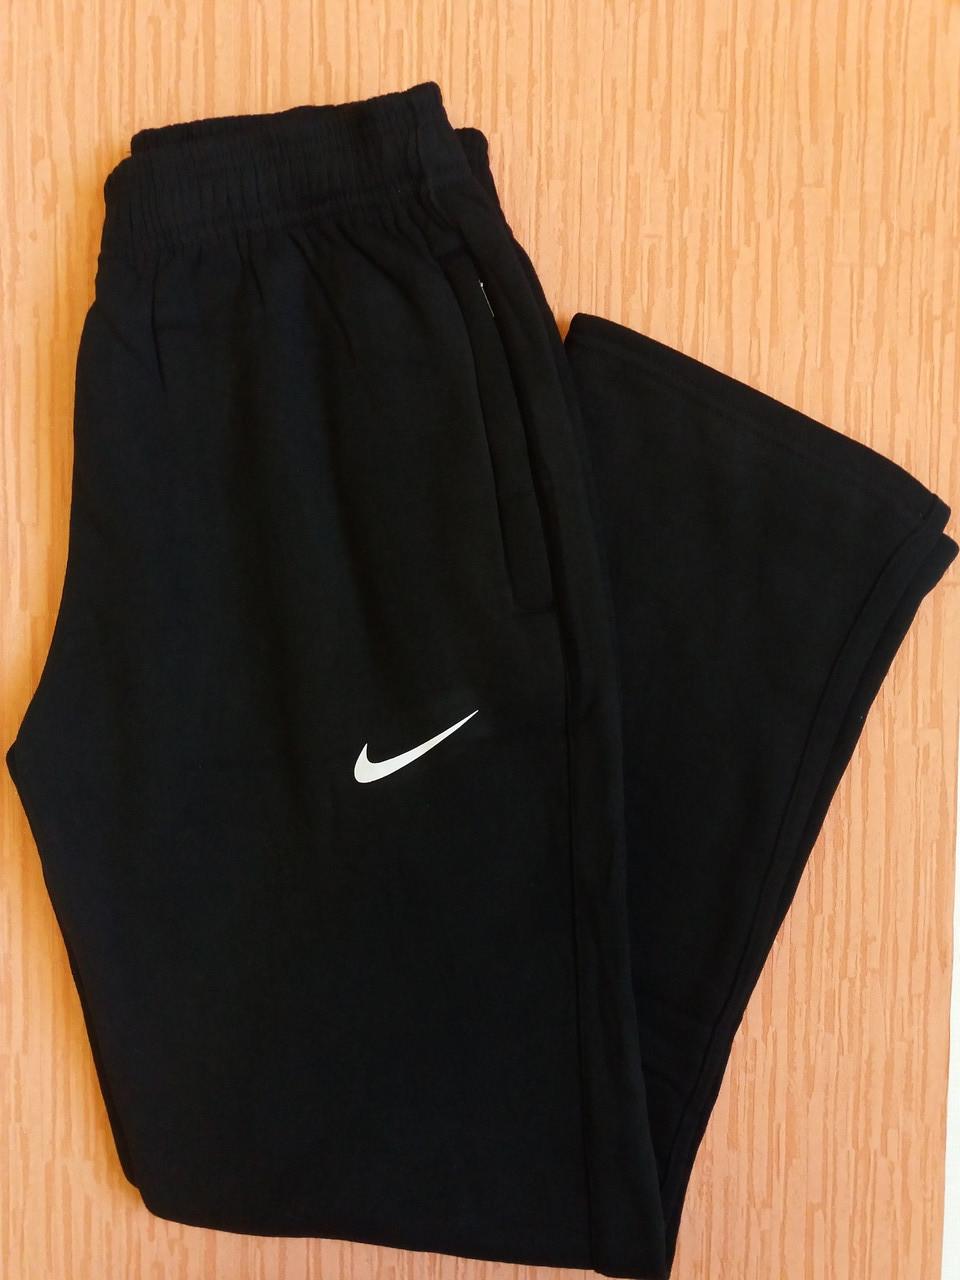 Спортивные штаны тёплые трехнитка на флисе р-р от 46 по 48.От 4шт по 125грн